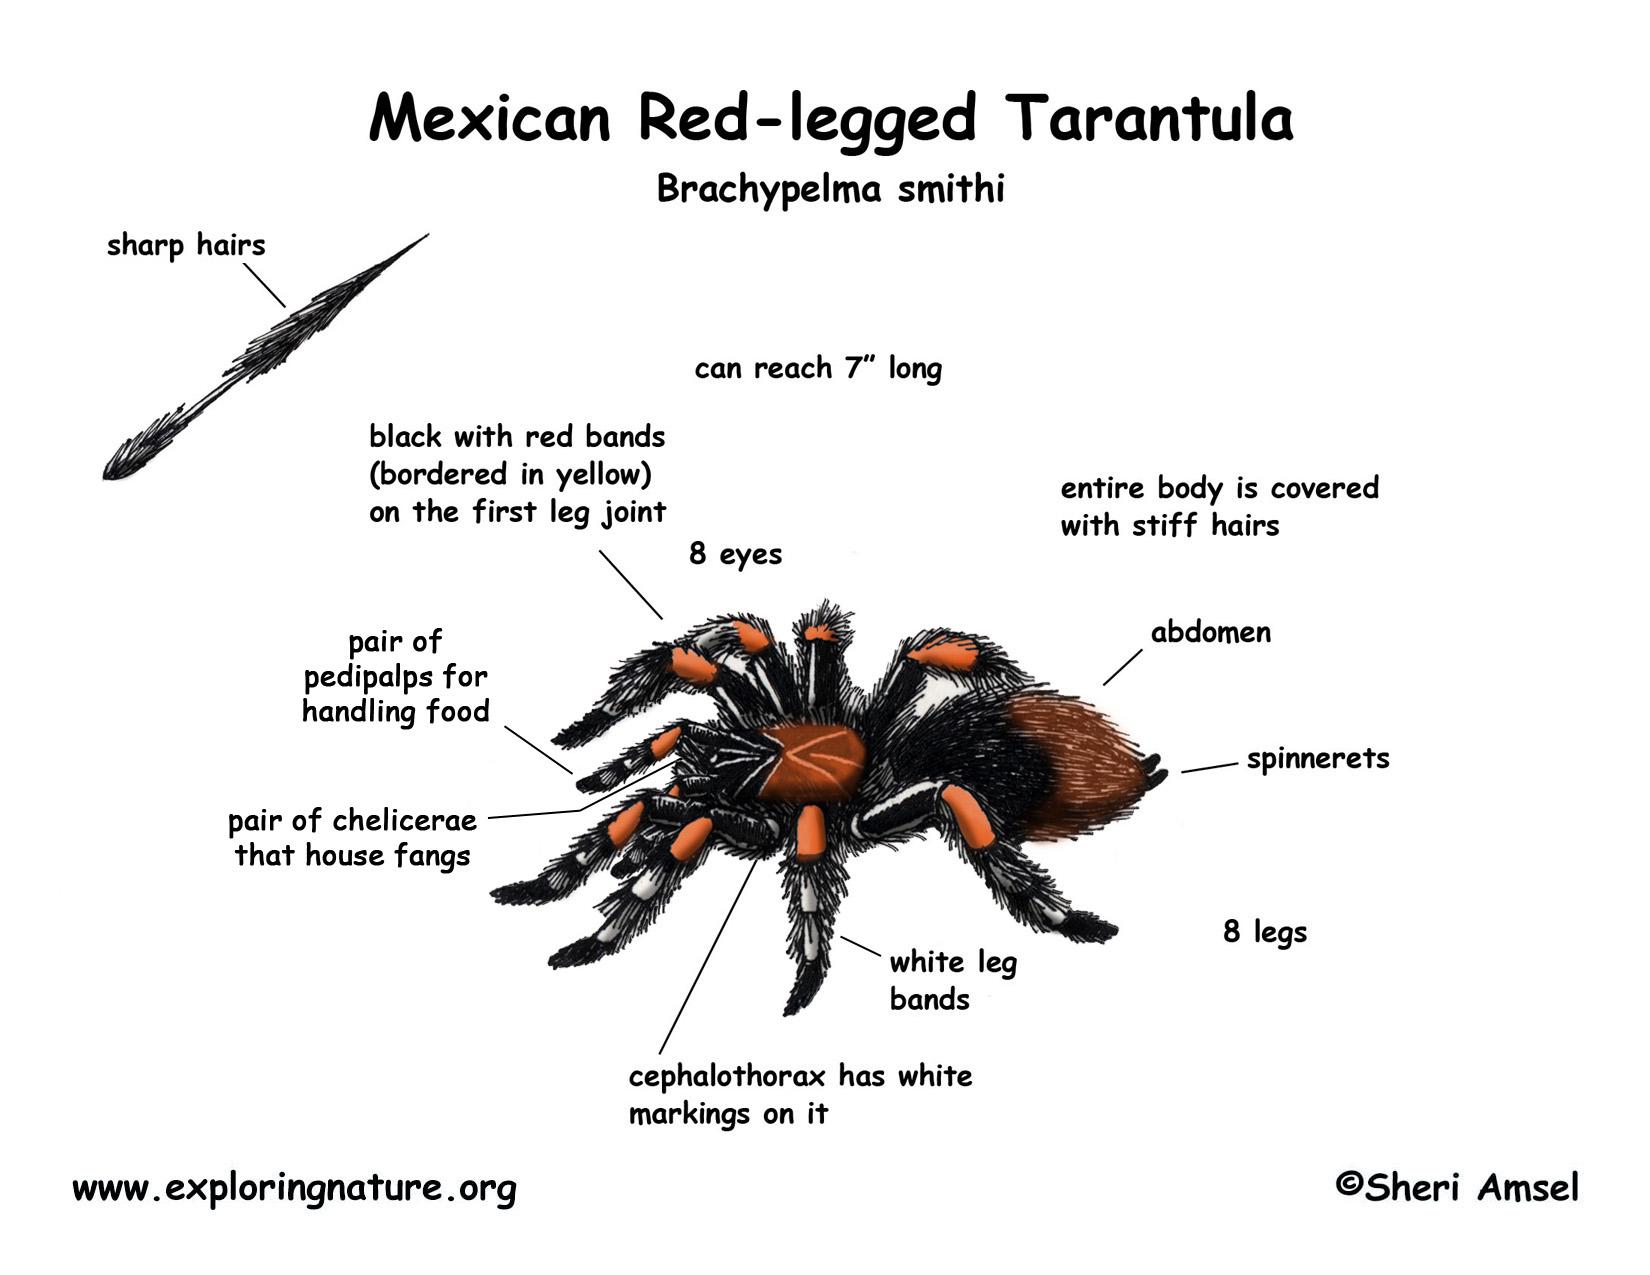 Tarantula (Mexican Red-legged)